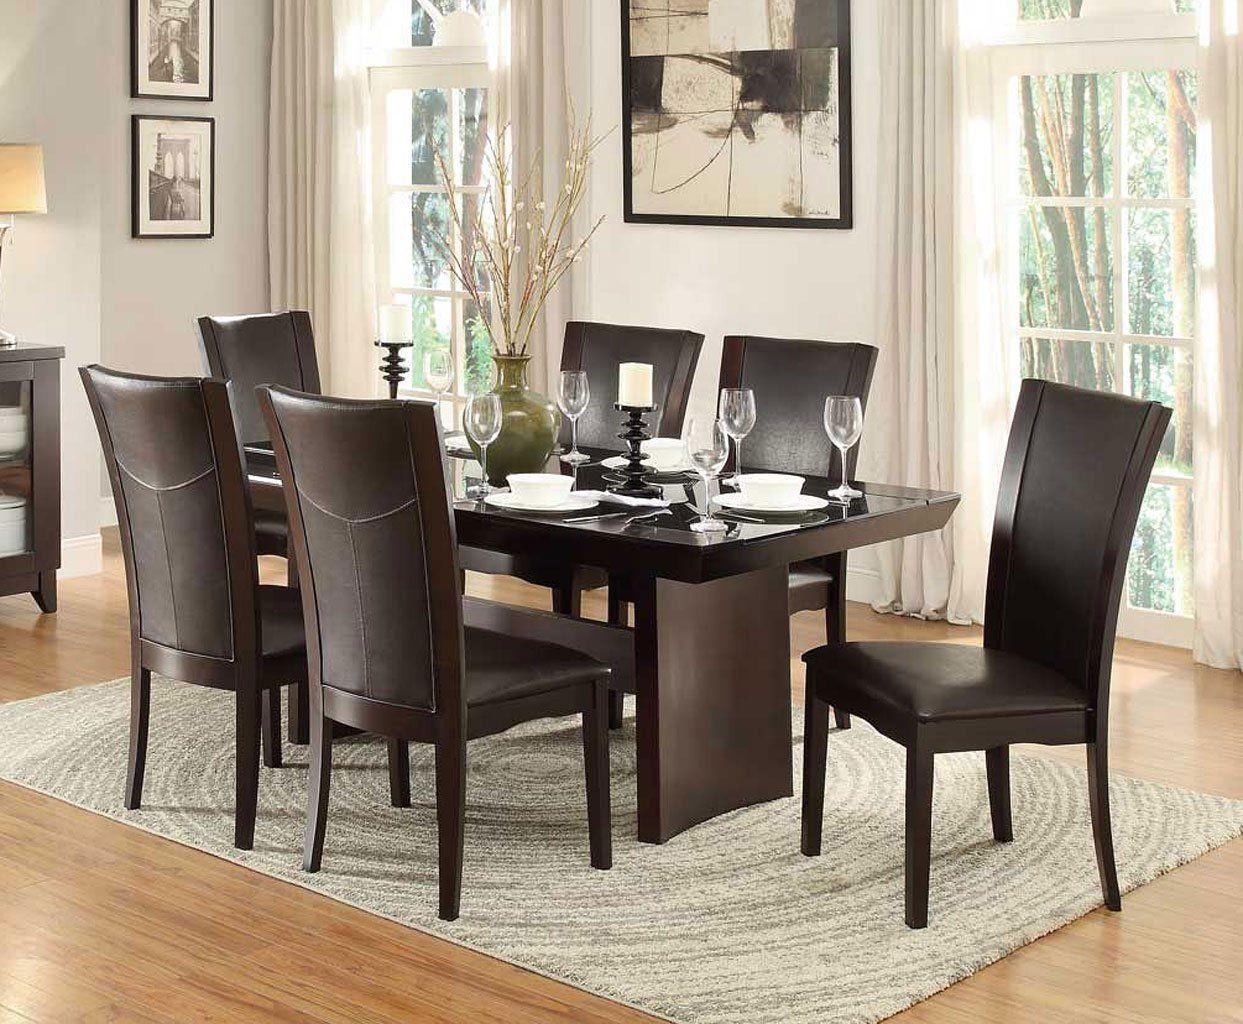 Daisy Glass Insert Dining Room Set W Dark Brown Chairs Dinning